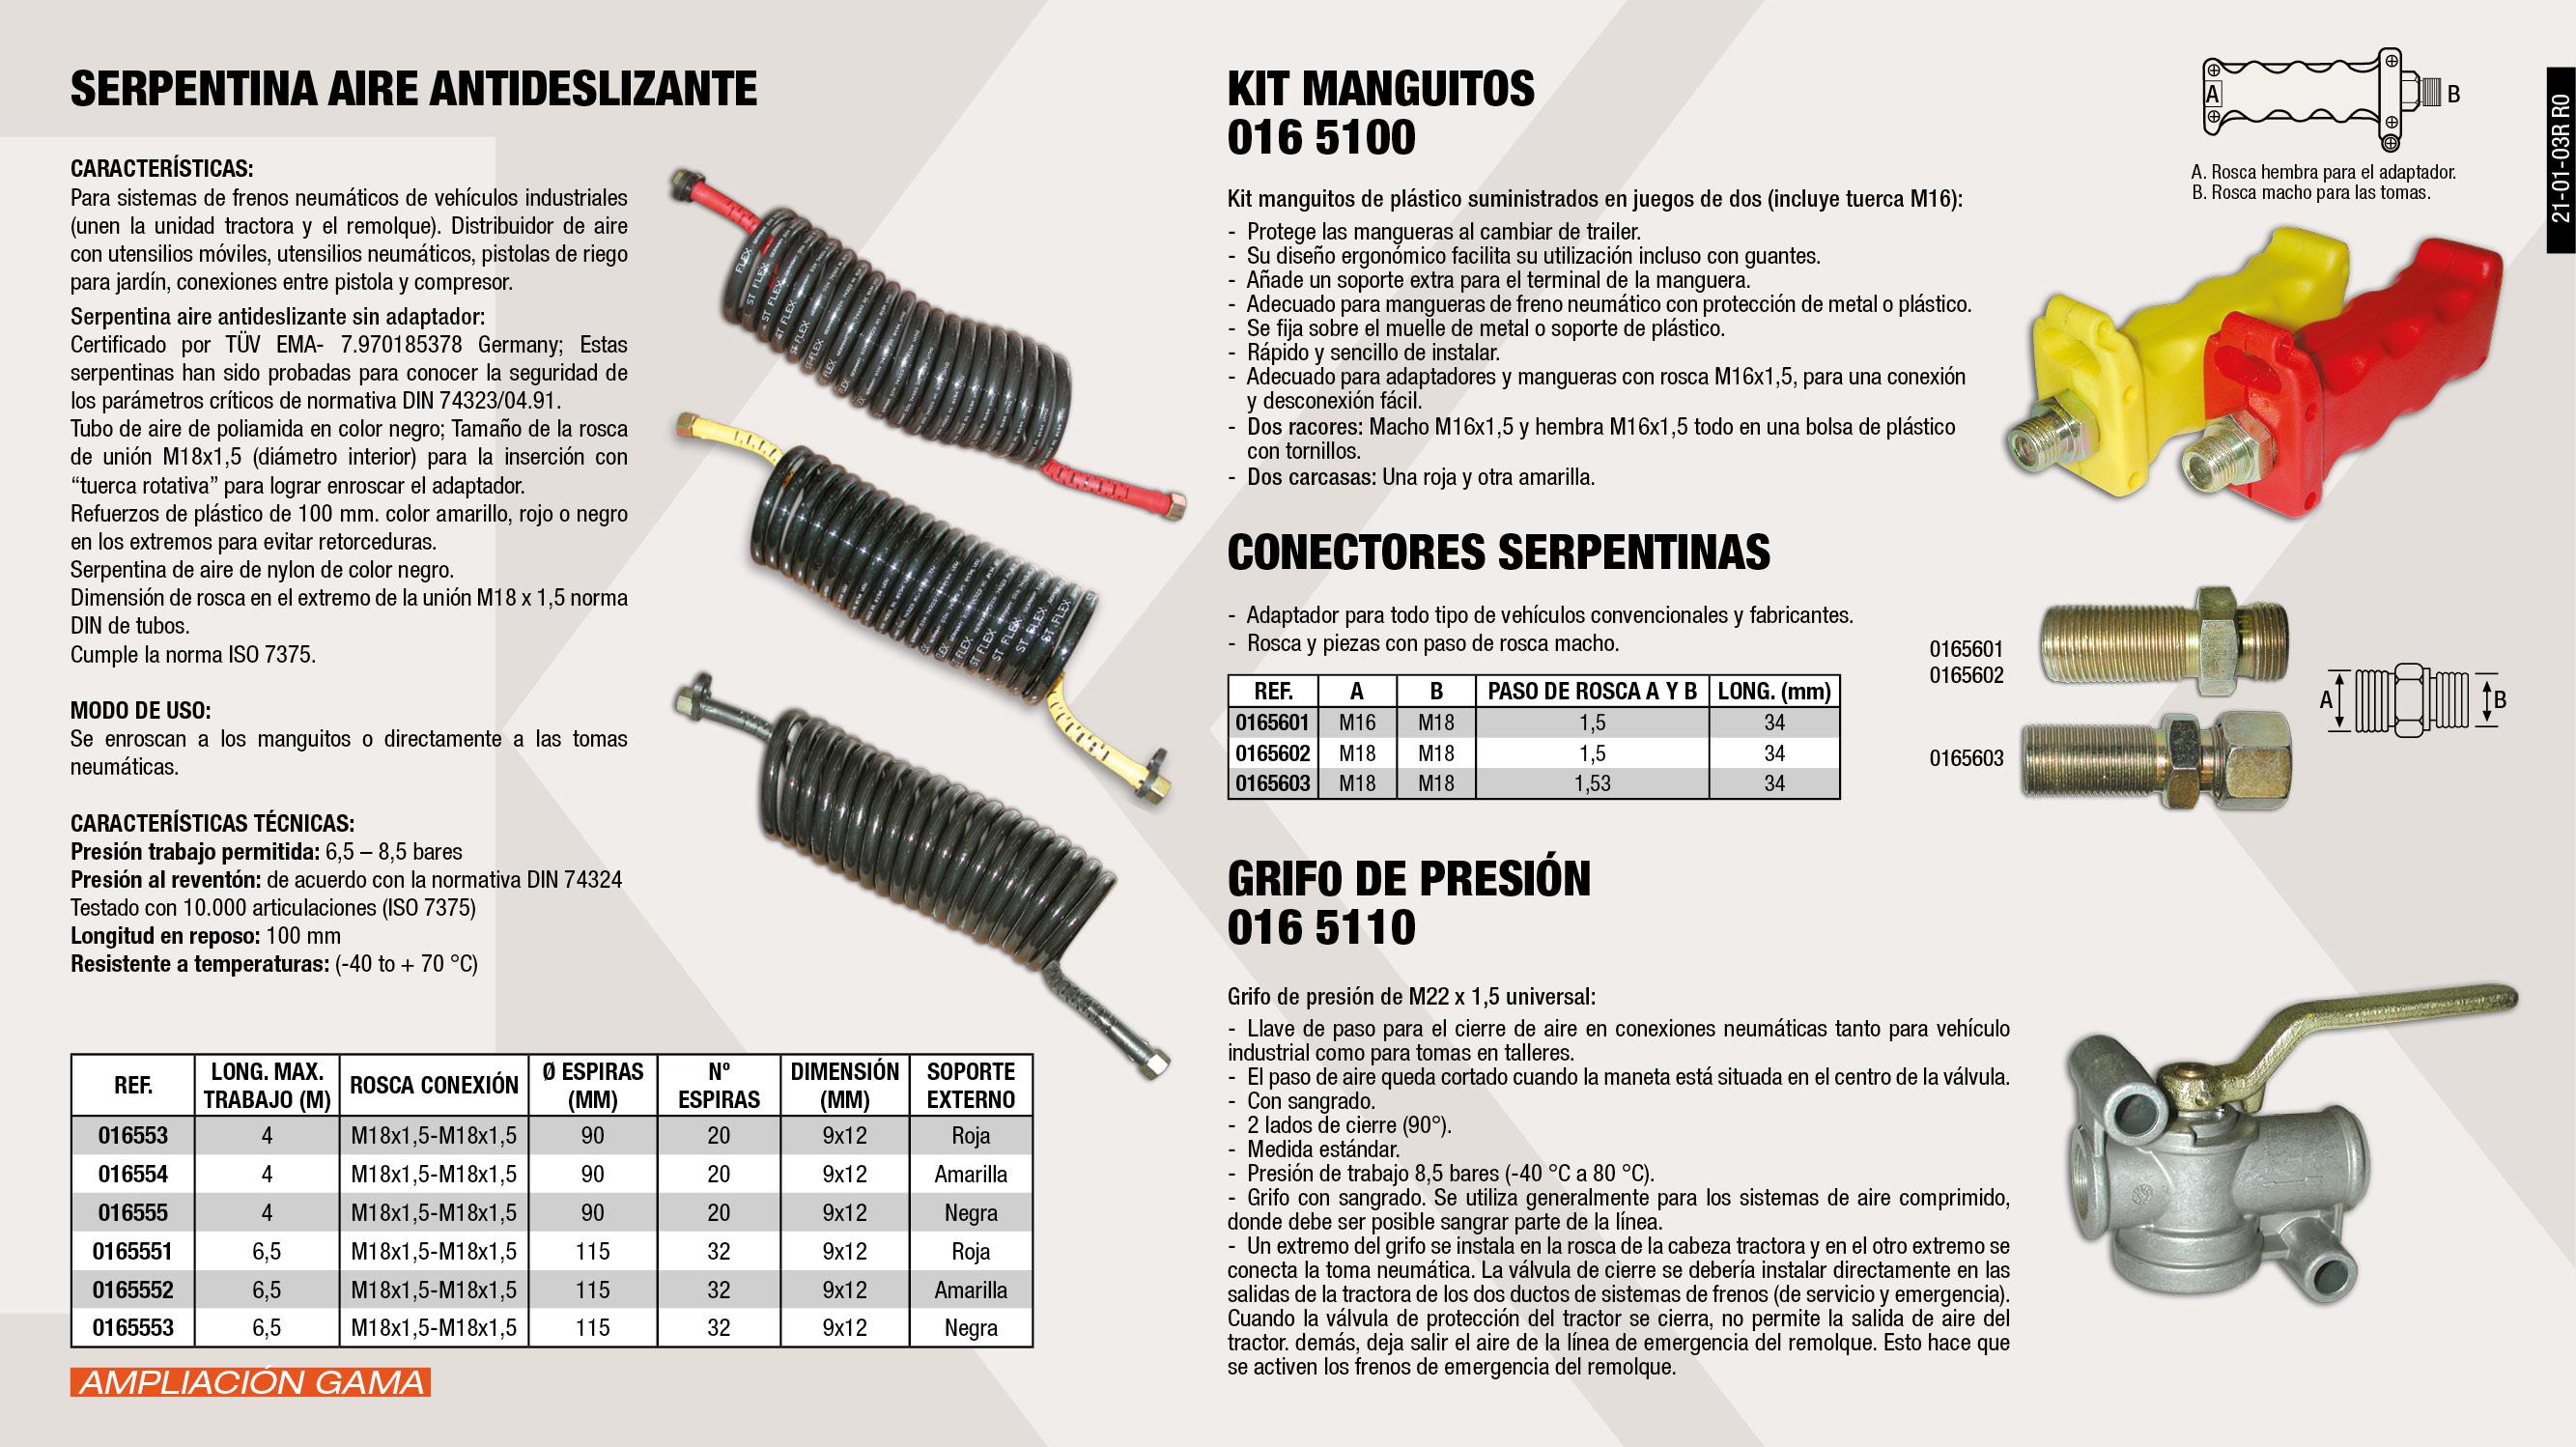 CONECTOR SERPENTINA M16X1,5-M18X1,5 L:34MM                  ,  SERPENTINA AIRE ANTIDESLIZANTE ROJA M18X1,5 6,5MT           ,  SERPENTINA AIRE ANTIDESLIZANTE NEGRA M18X1,5 6,5MT          ,  CONECTOR SERPENTINA M18X1,5-M18X1,5 L:34MM.                 ,  CONECTOR SERP. C/TUERCA M 18X1.5                            ,  SERPENTINA AIRE ANTIDESLIZANTE AMA M18X1,5 6,5MT            ,  GRIFO DE PRESION M22X1,5                                    ,  SERPENTINA AIRE ANTIDESLIZANTE ROJA M18X1,5                 ,  SERPENTINA AIRE ANTIDESLIZANTE AM.M18X1,5                   ,  SERPENTINA AIRE ANTIDESLIZANTE NEG.M18X1,5                  ,  KIT MANGUITOS ROJO Y AMARILLO                               ,